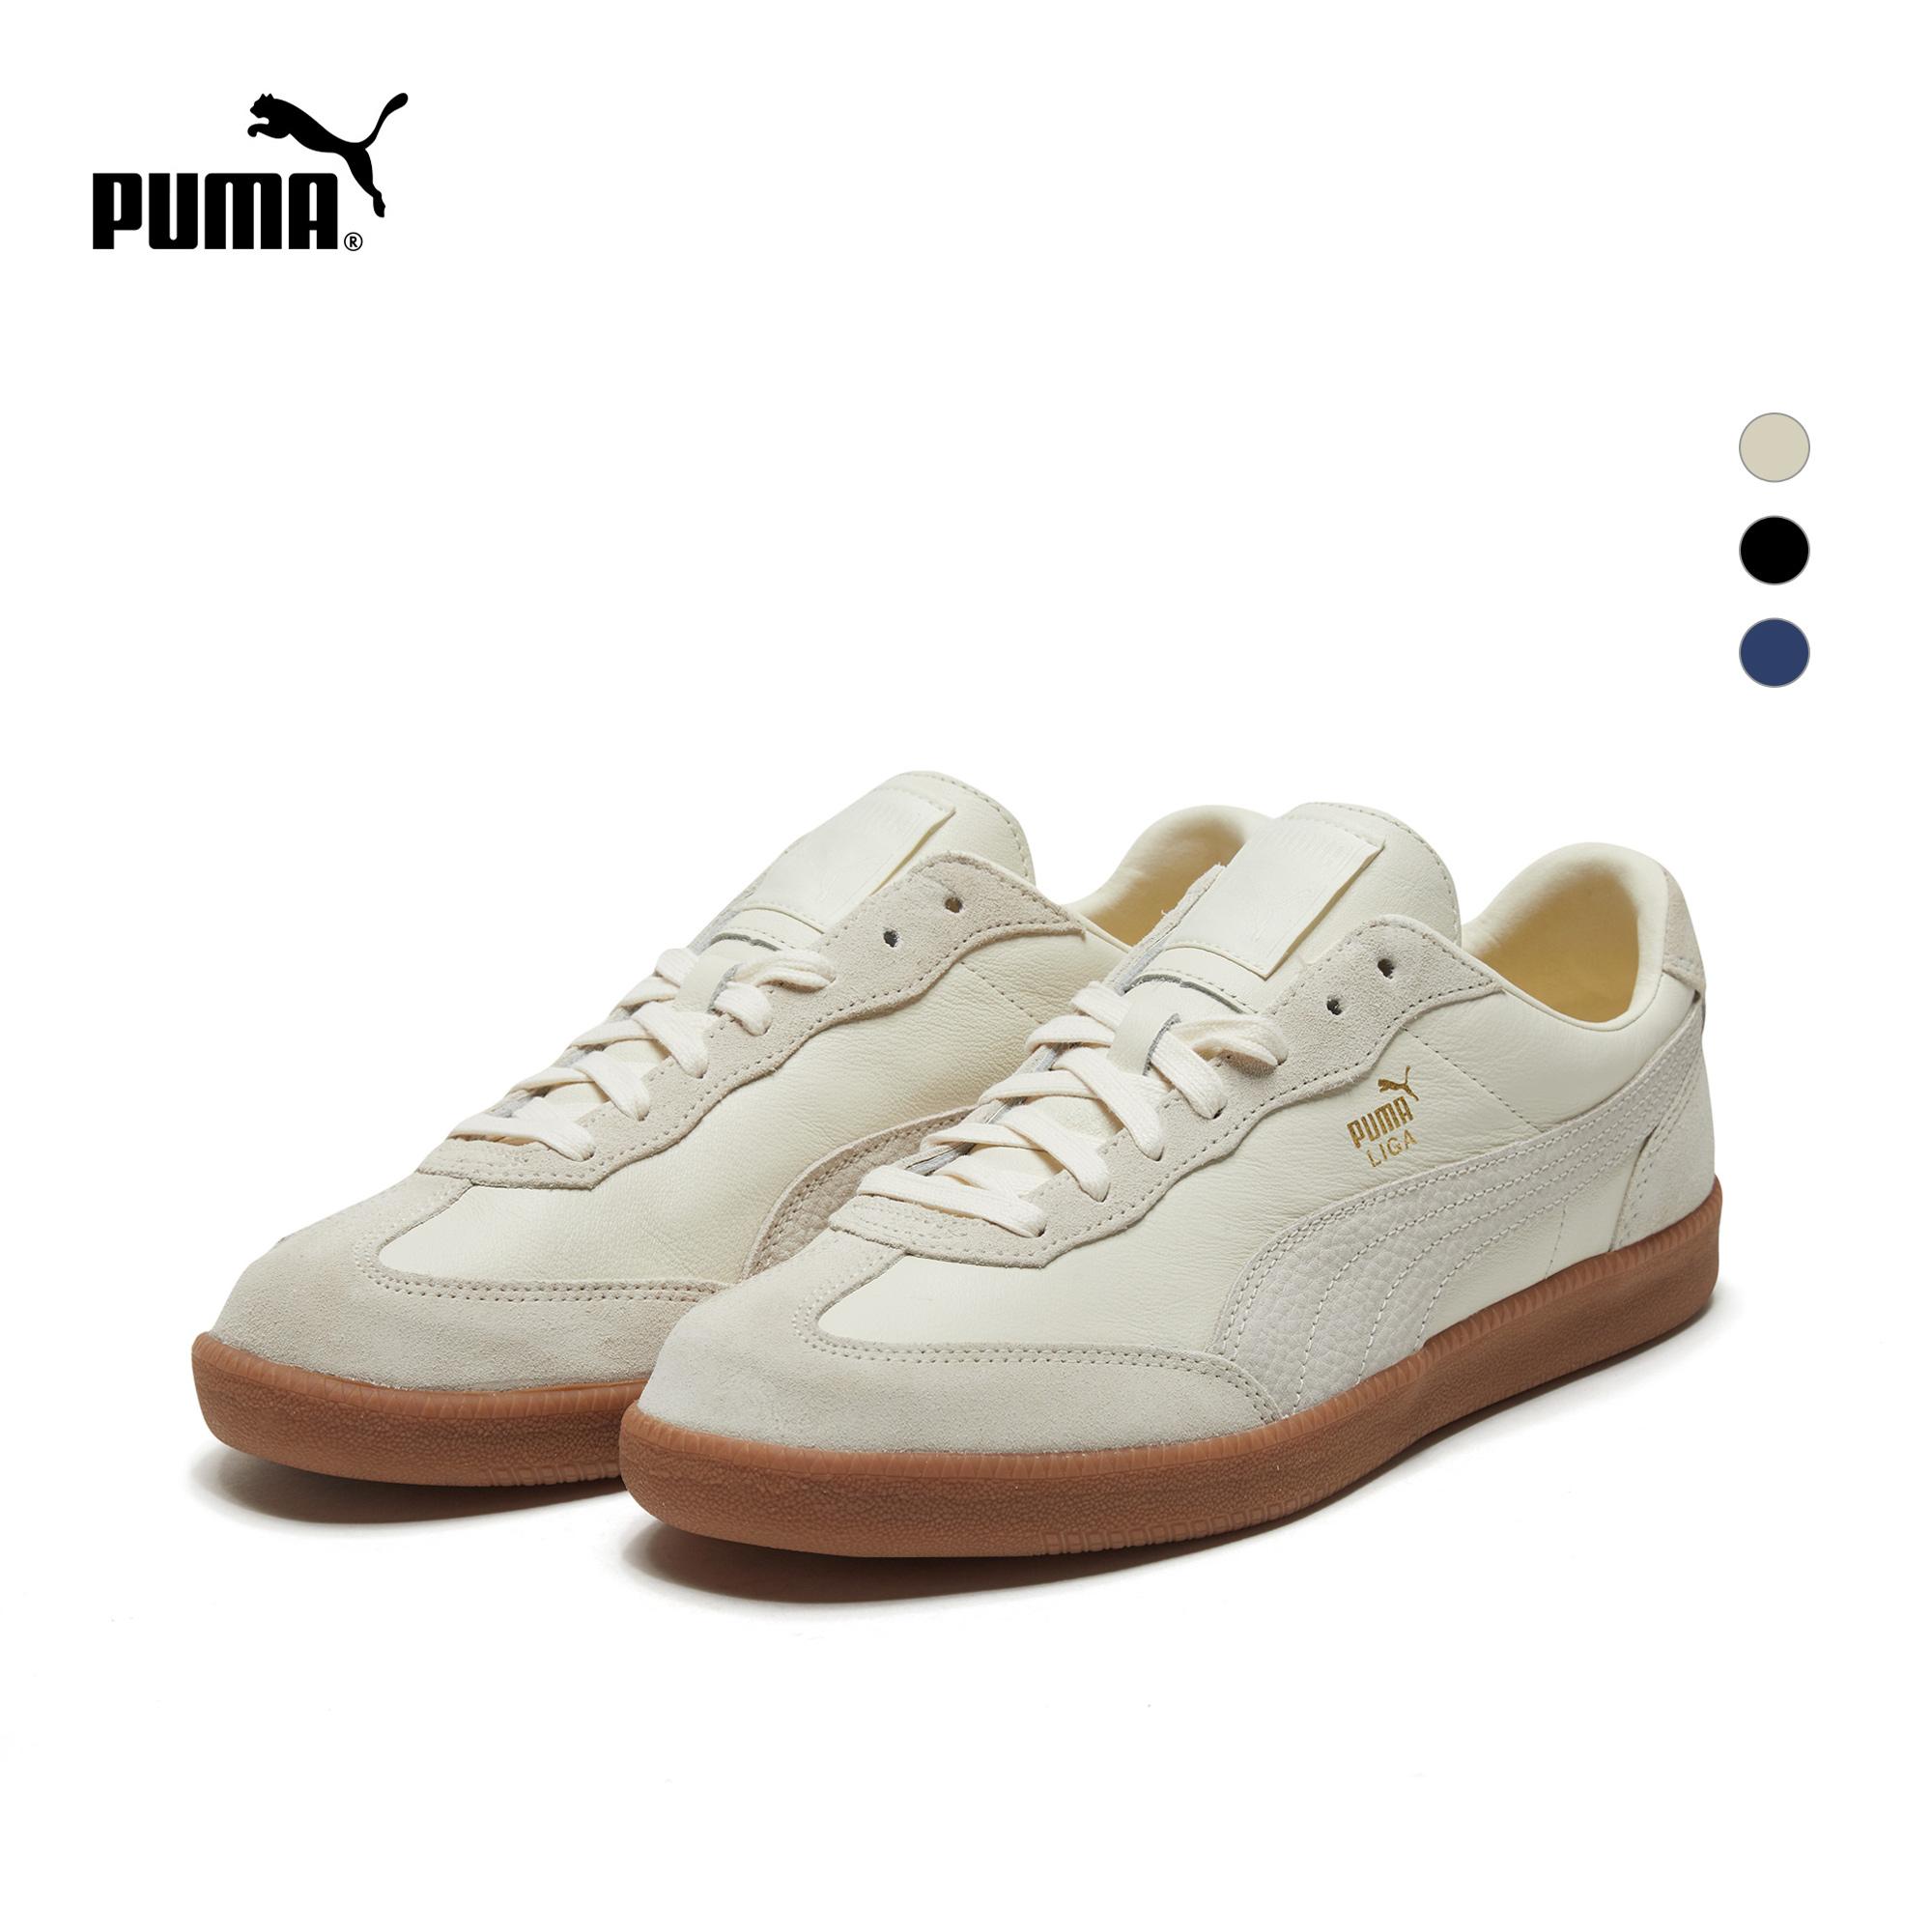 PUMA彪马官方正品 新款男子复古风休闲鞋LIGA LEATHER 364597